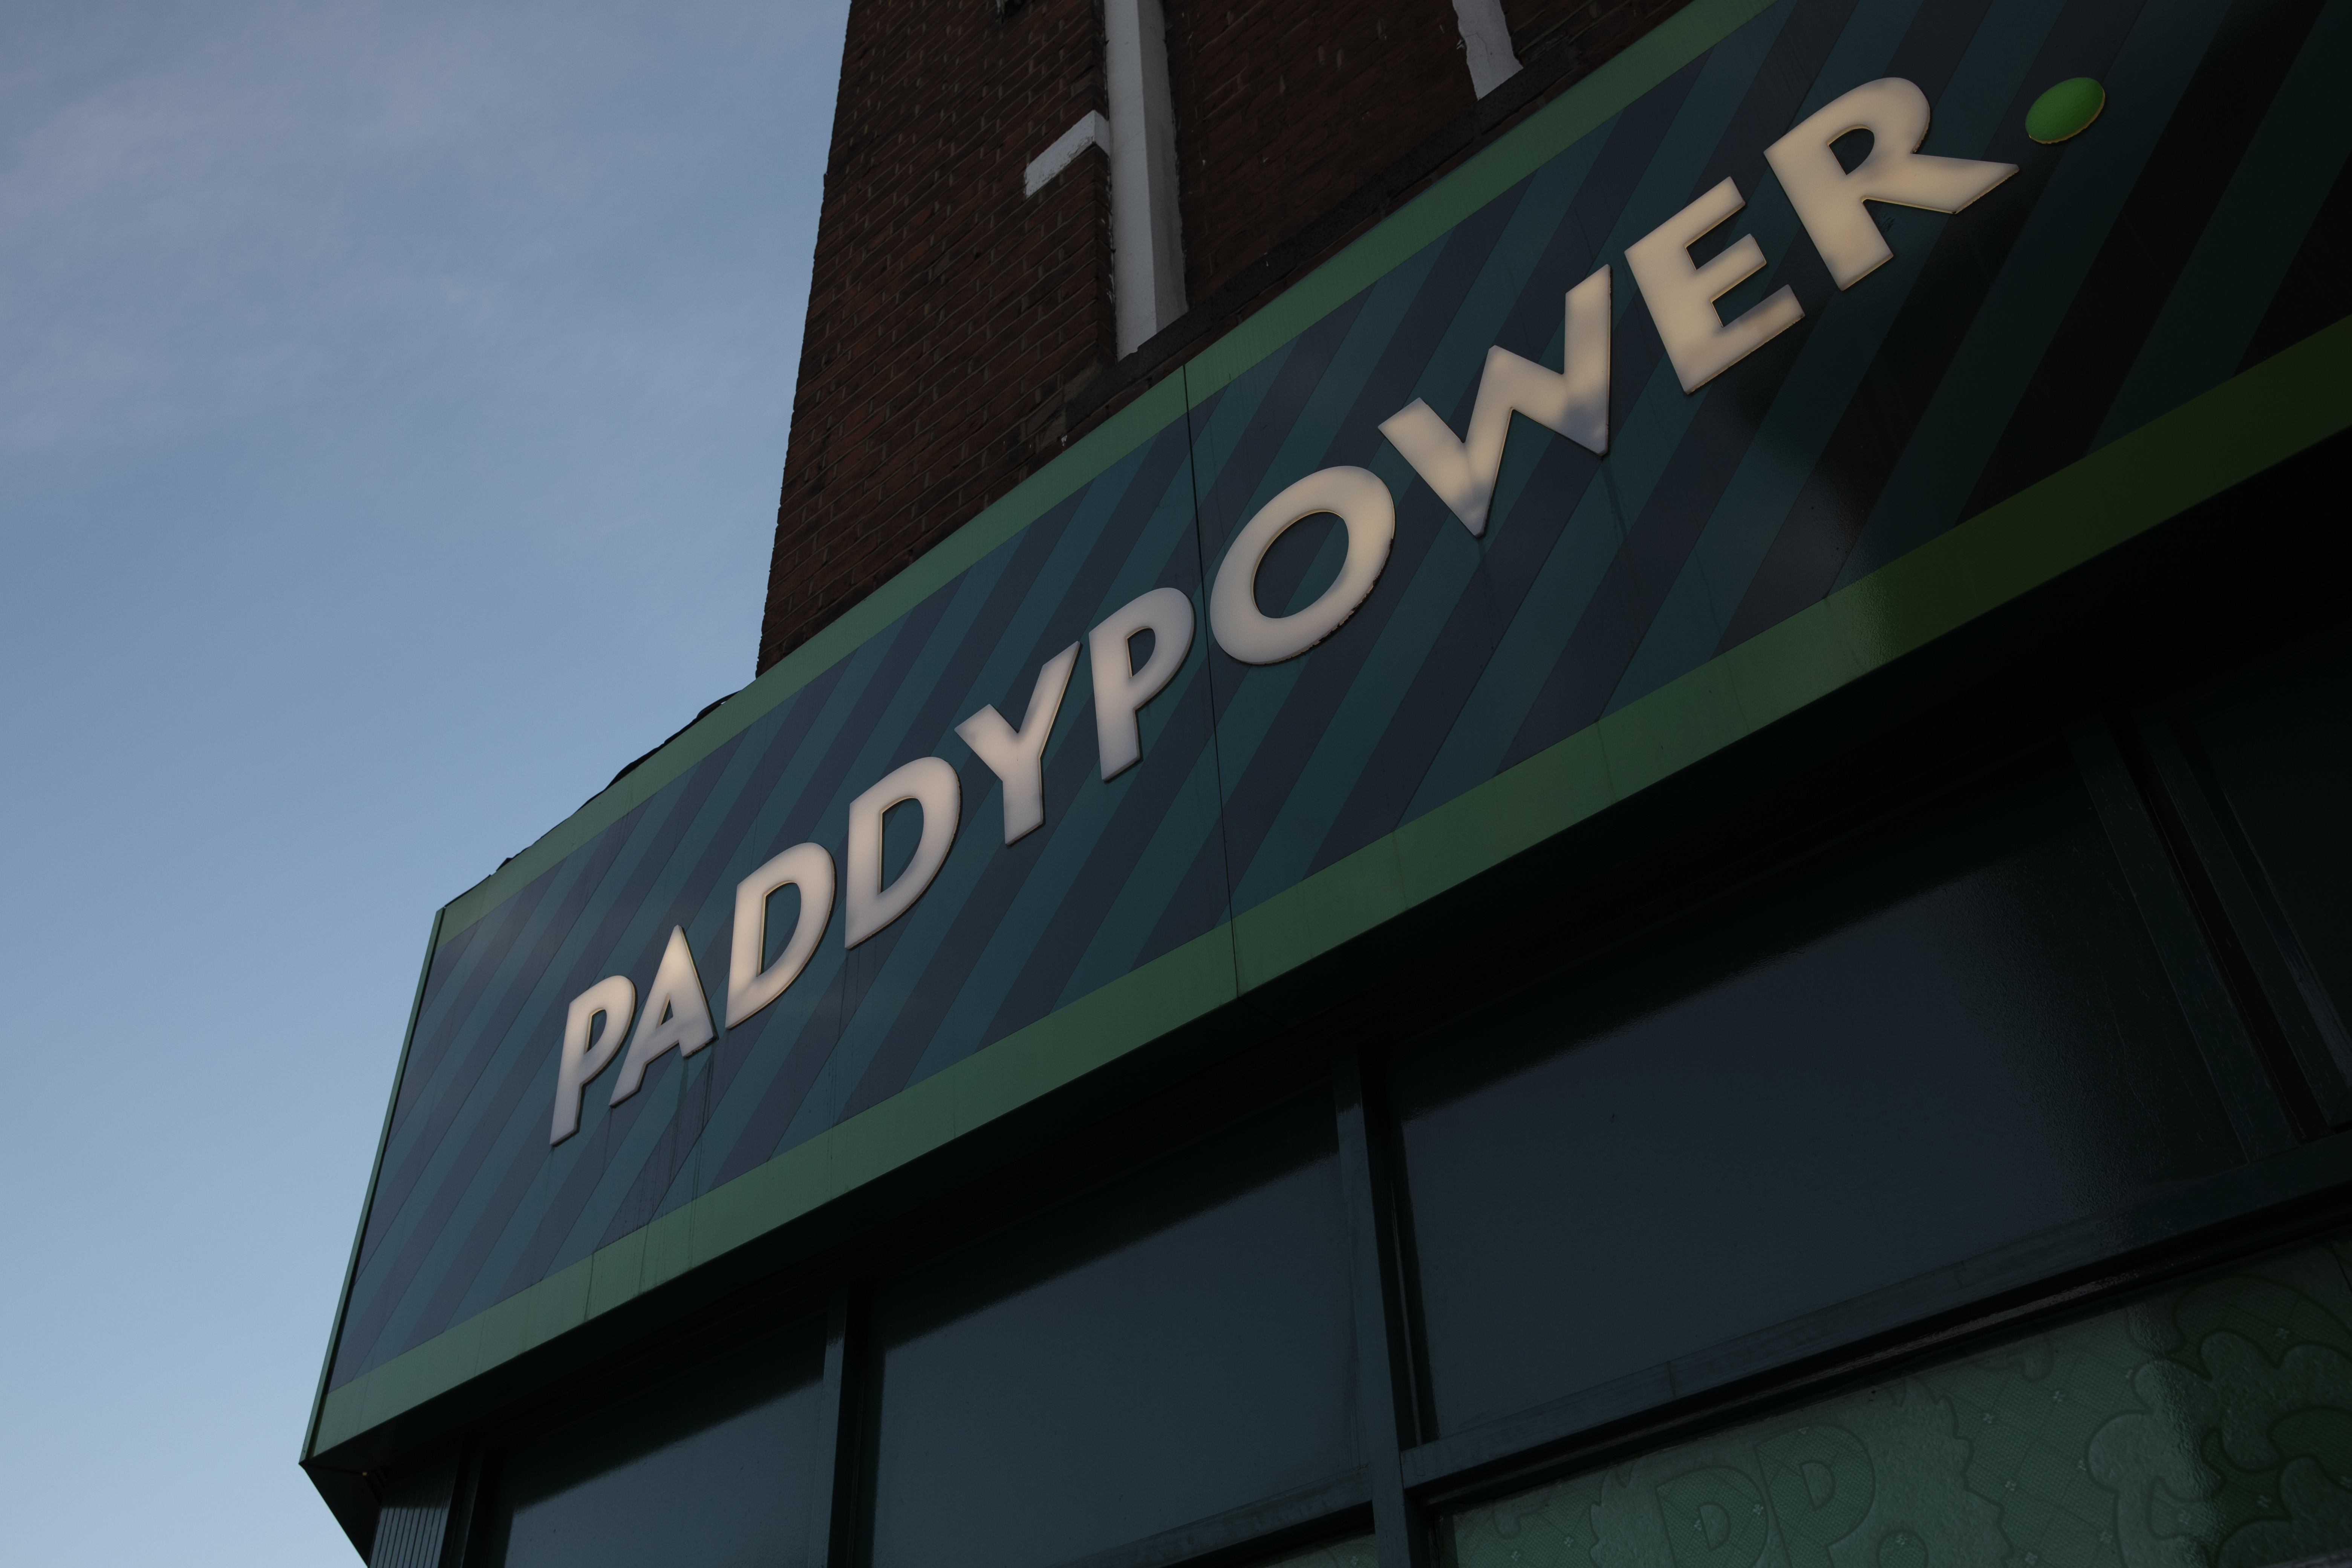 Paddy Power Betfair Archives - CityAM : CityAM